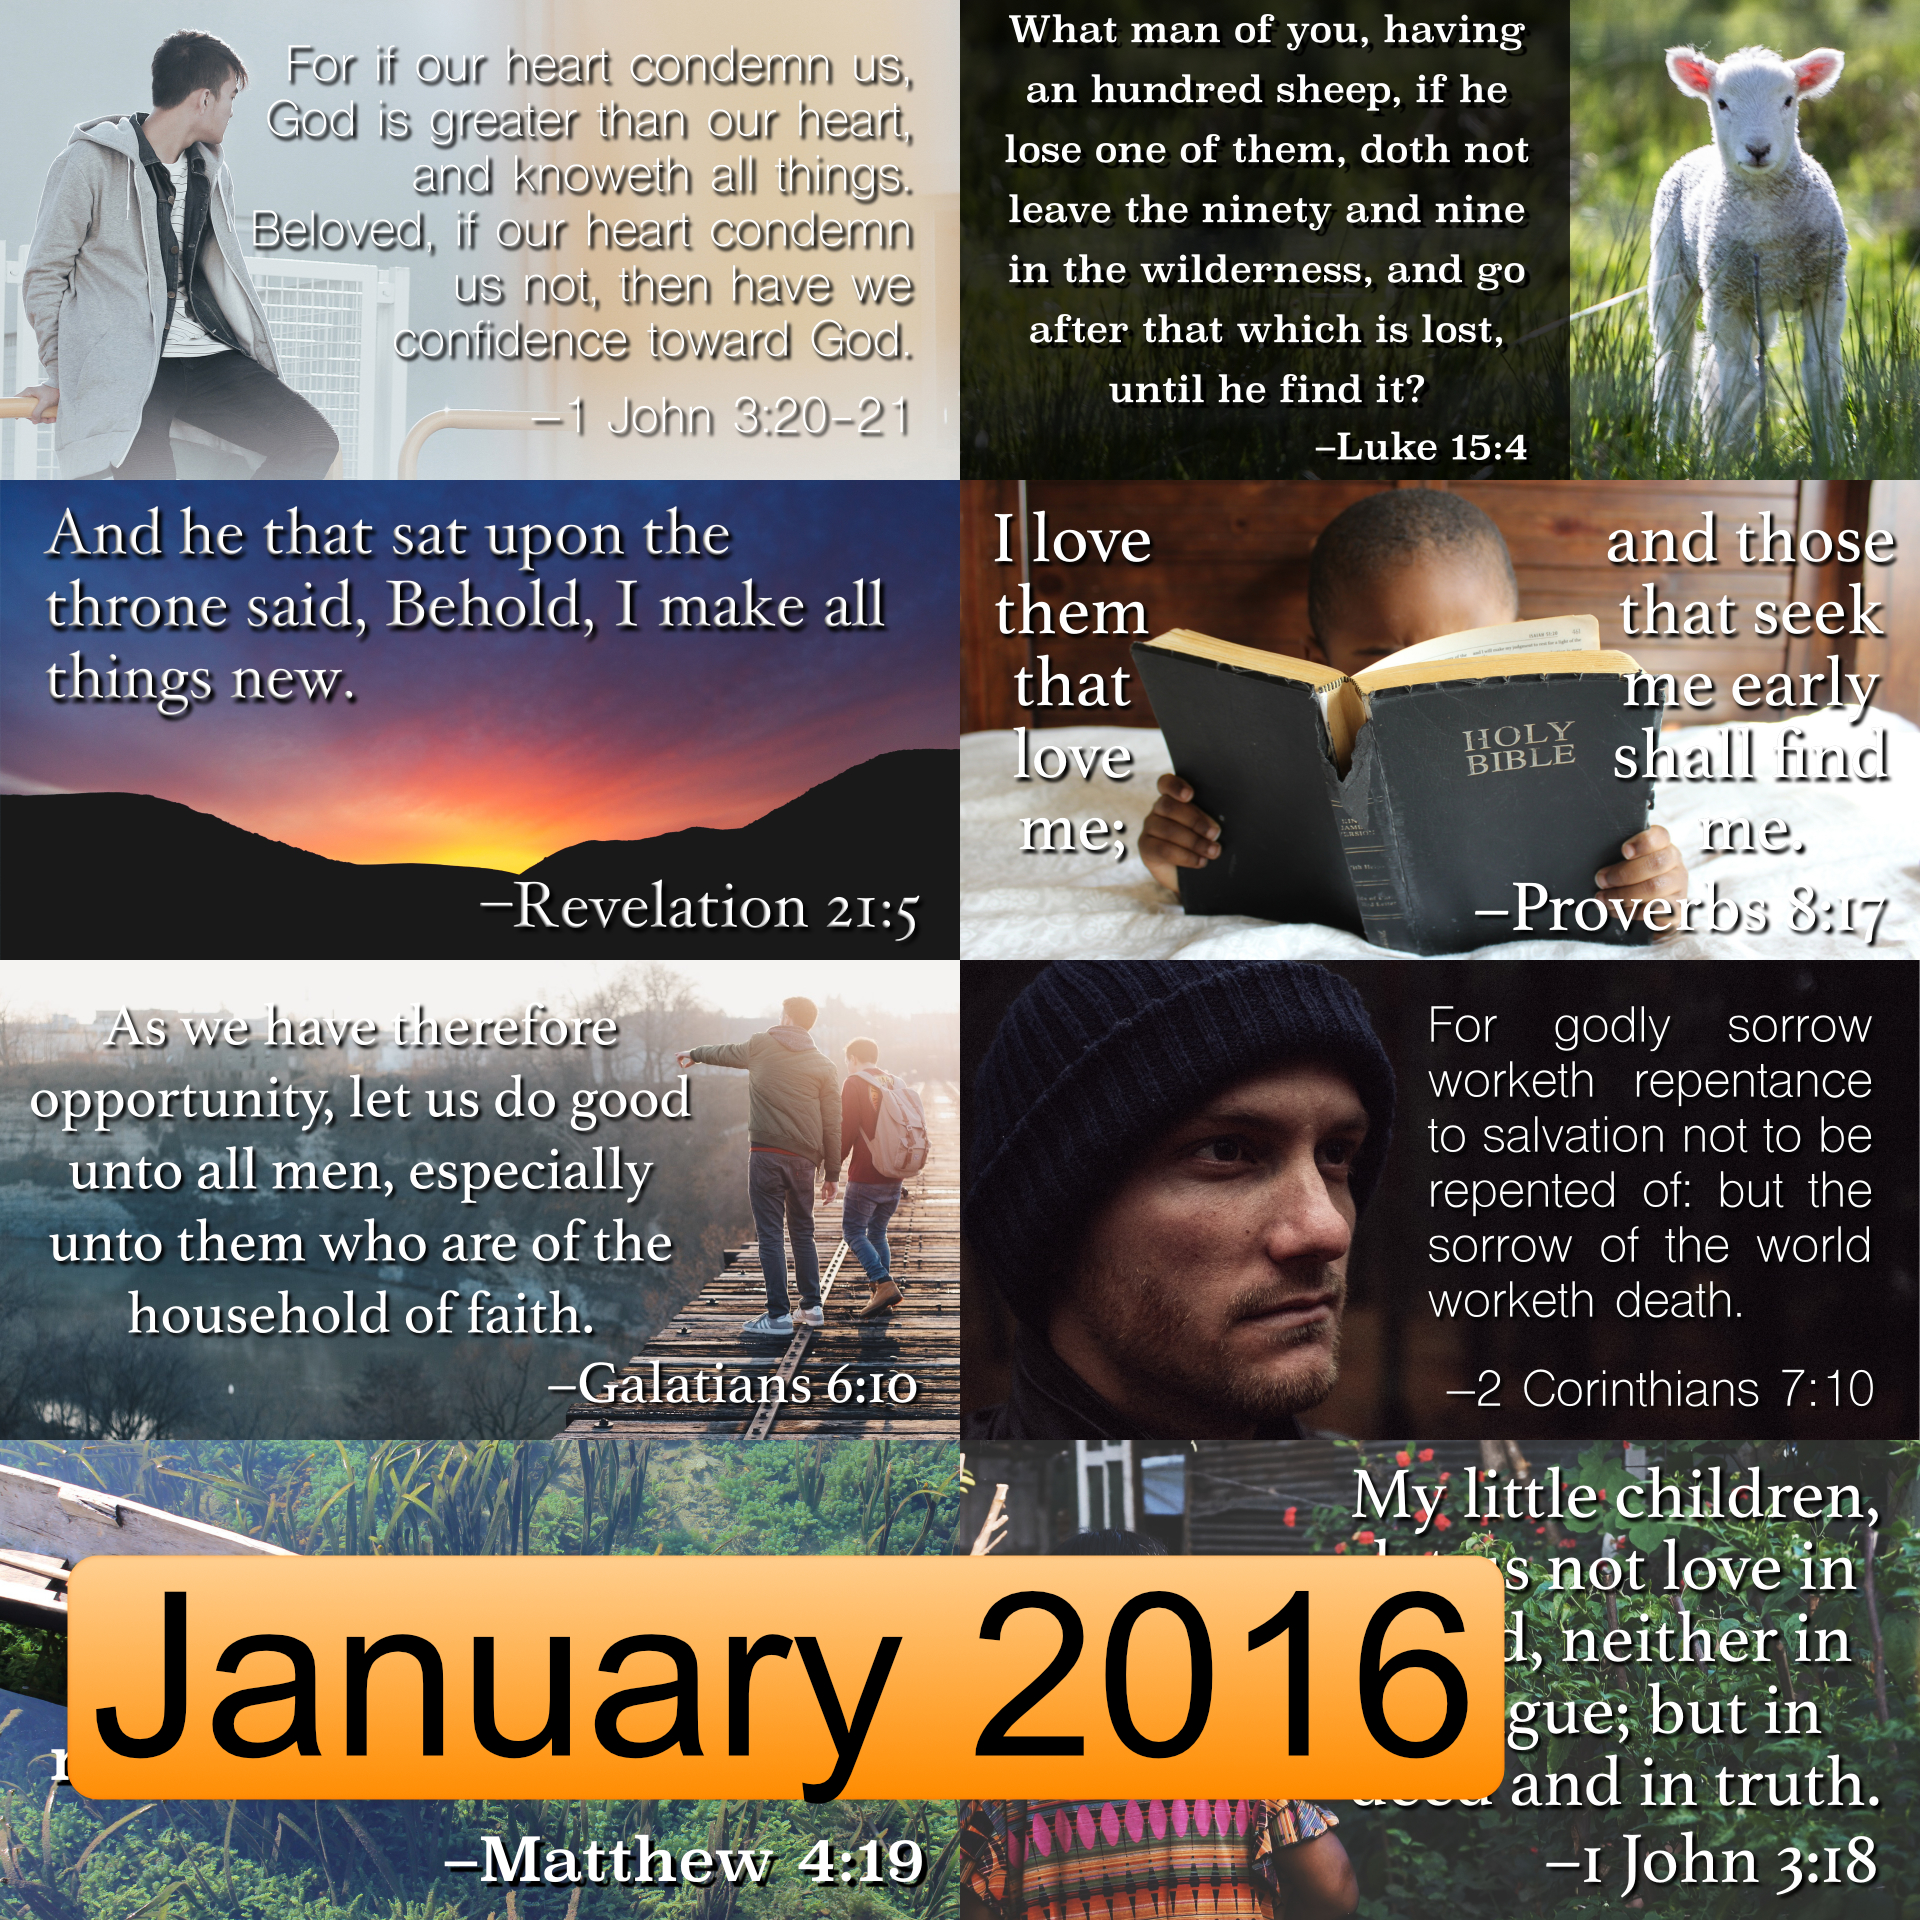 January 2016 Image Pack